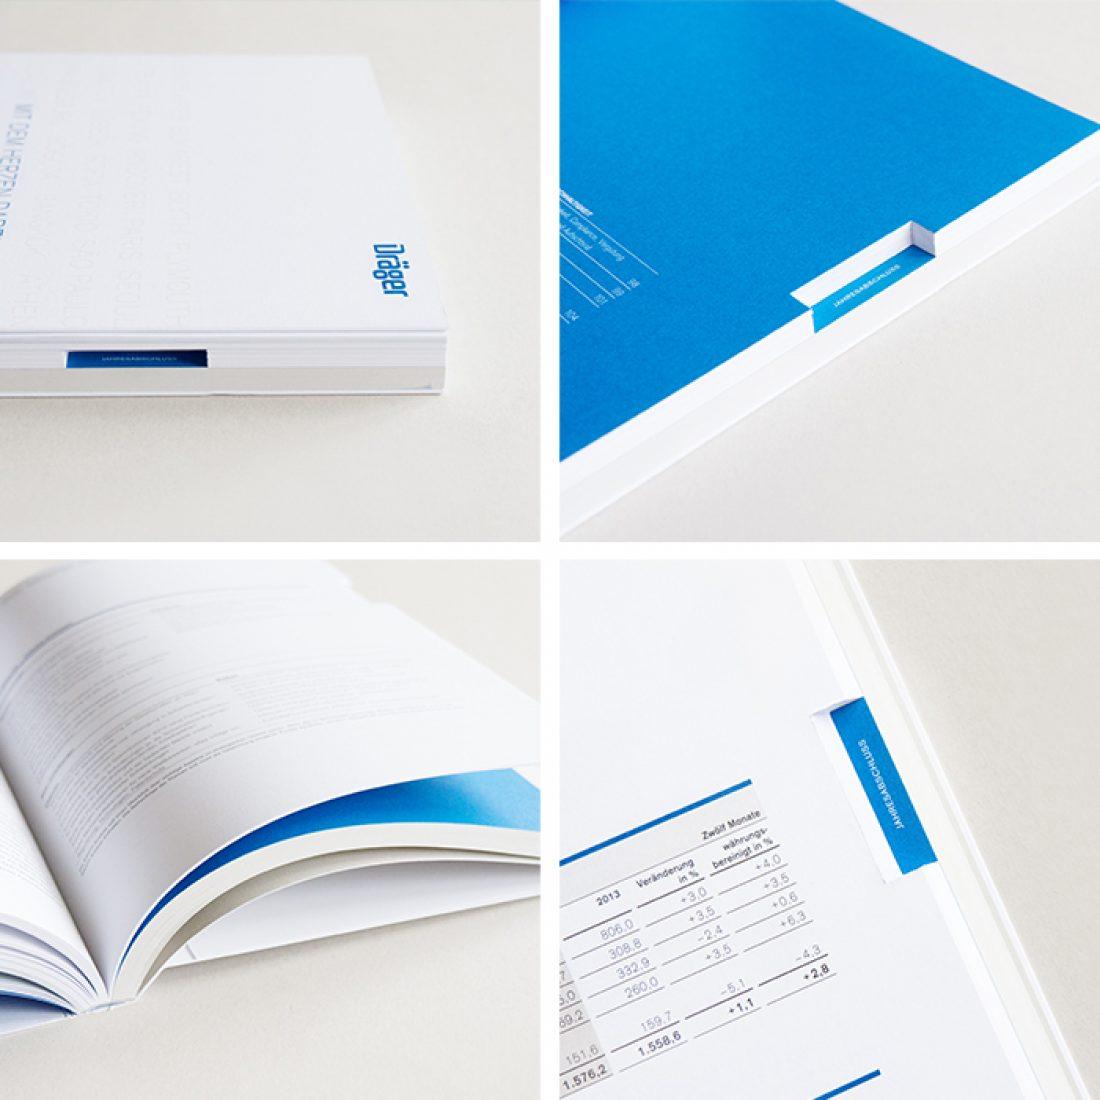 Integralis-Referenz-Buch_Draeger